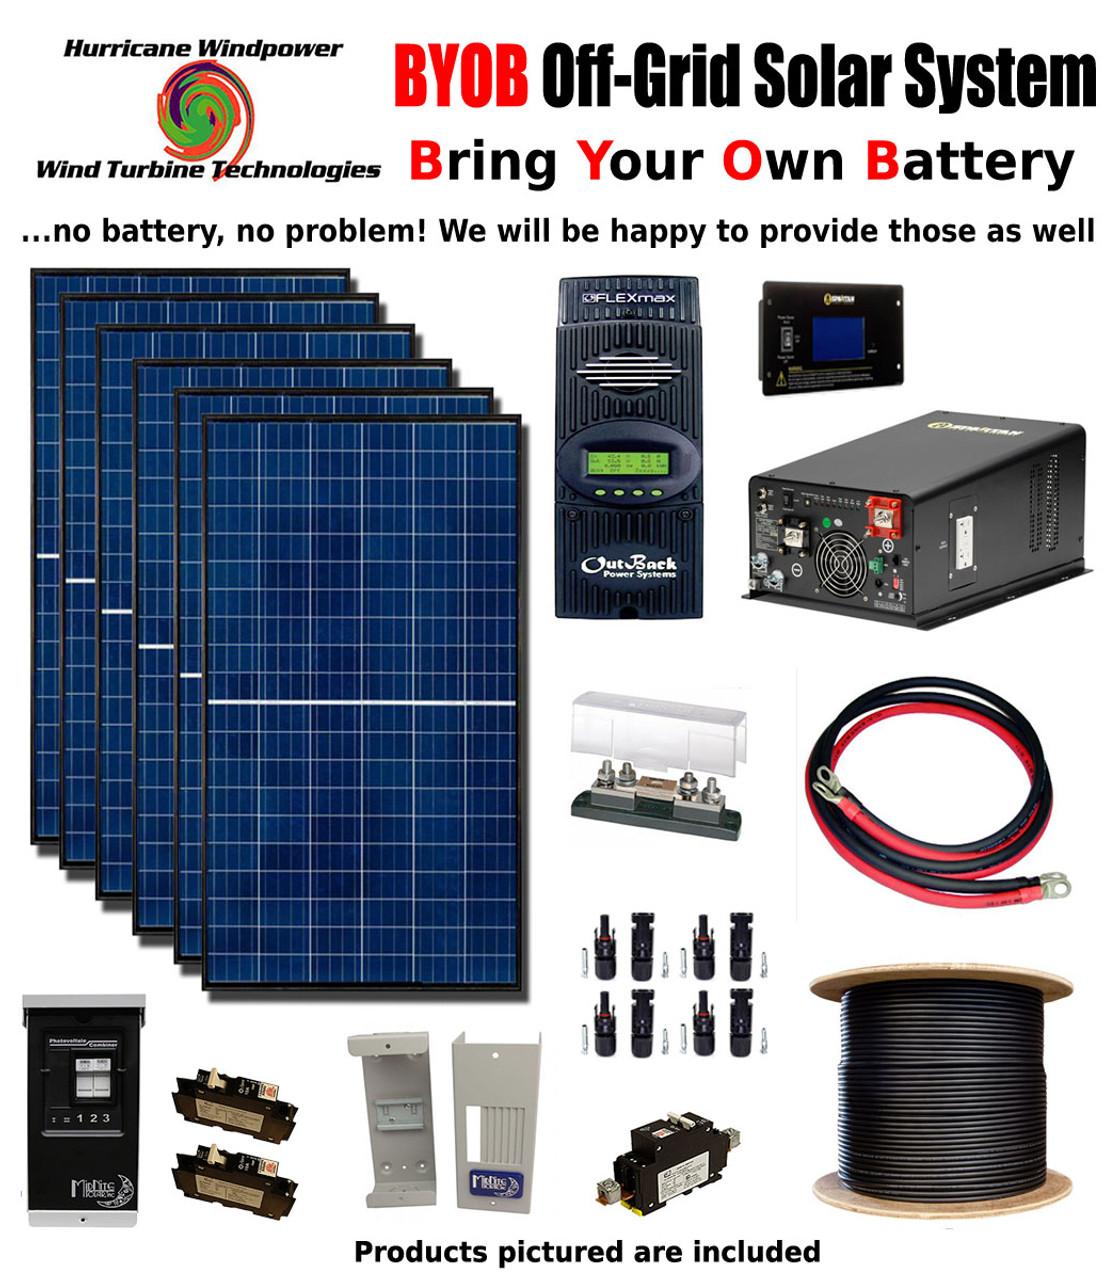 byob off grid 1740w 24v solar panel kit tiny house cabin pv system outback fm80 [ 1120 x 1280 Pixel ]